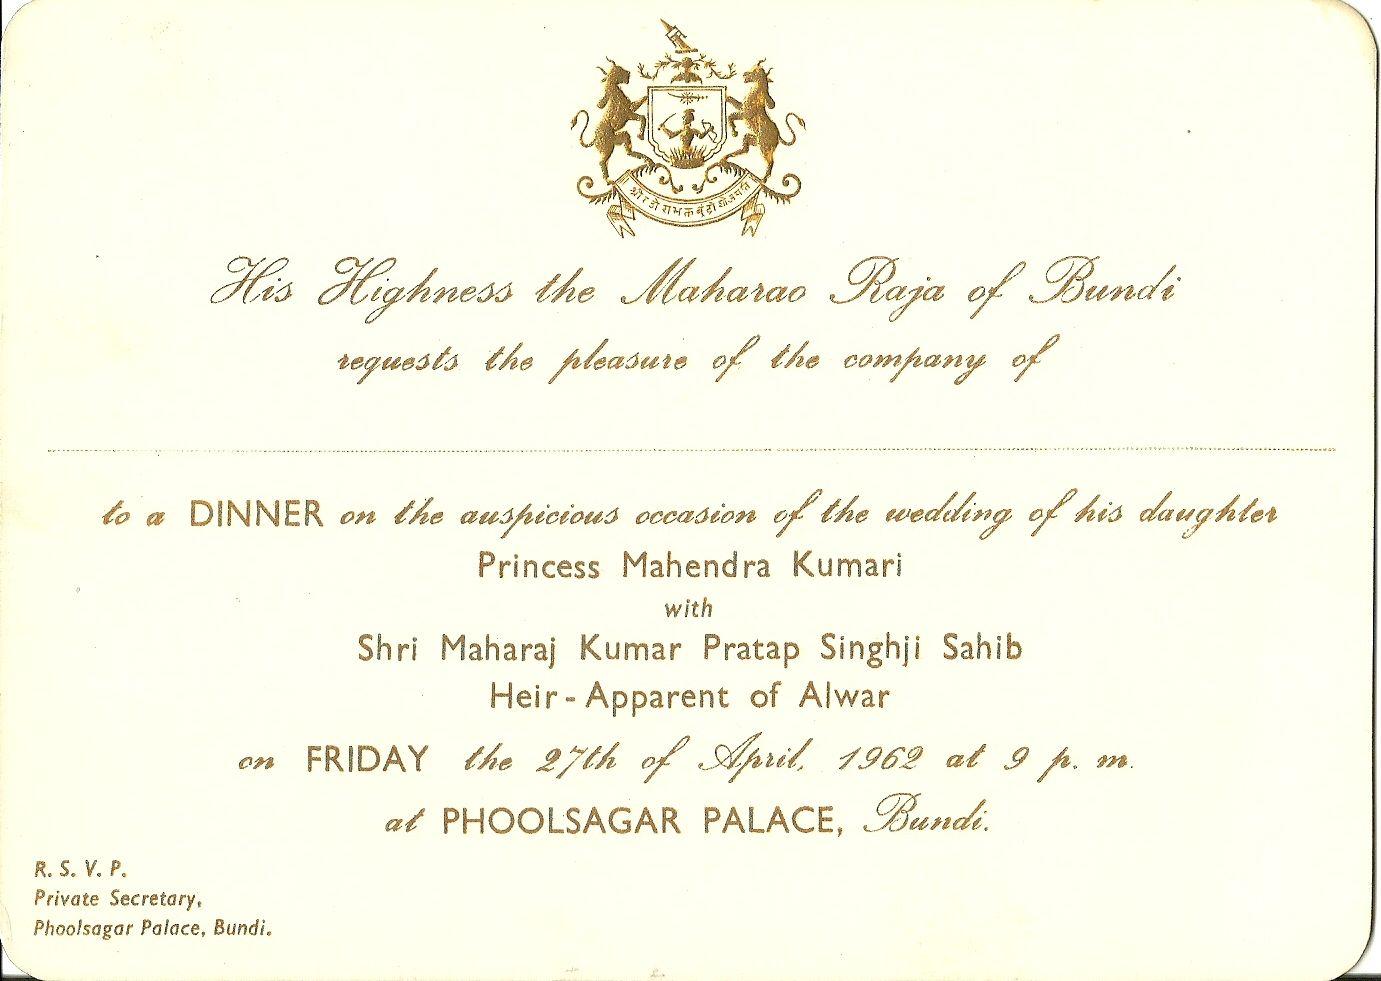 Bundi Maharaja S Dinner Invitation Card Invitations Pig Birthday Invitations Invitation Cards